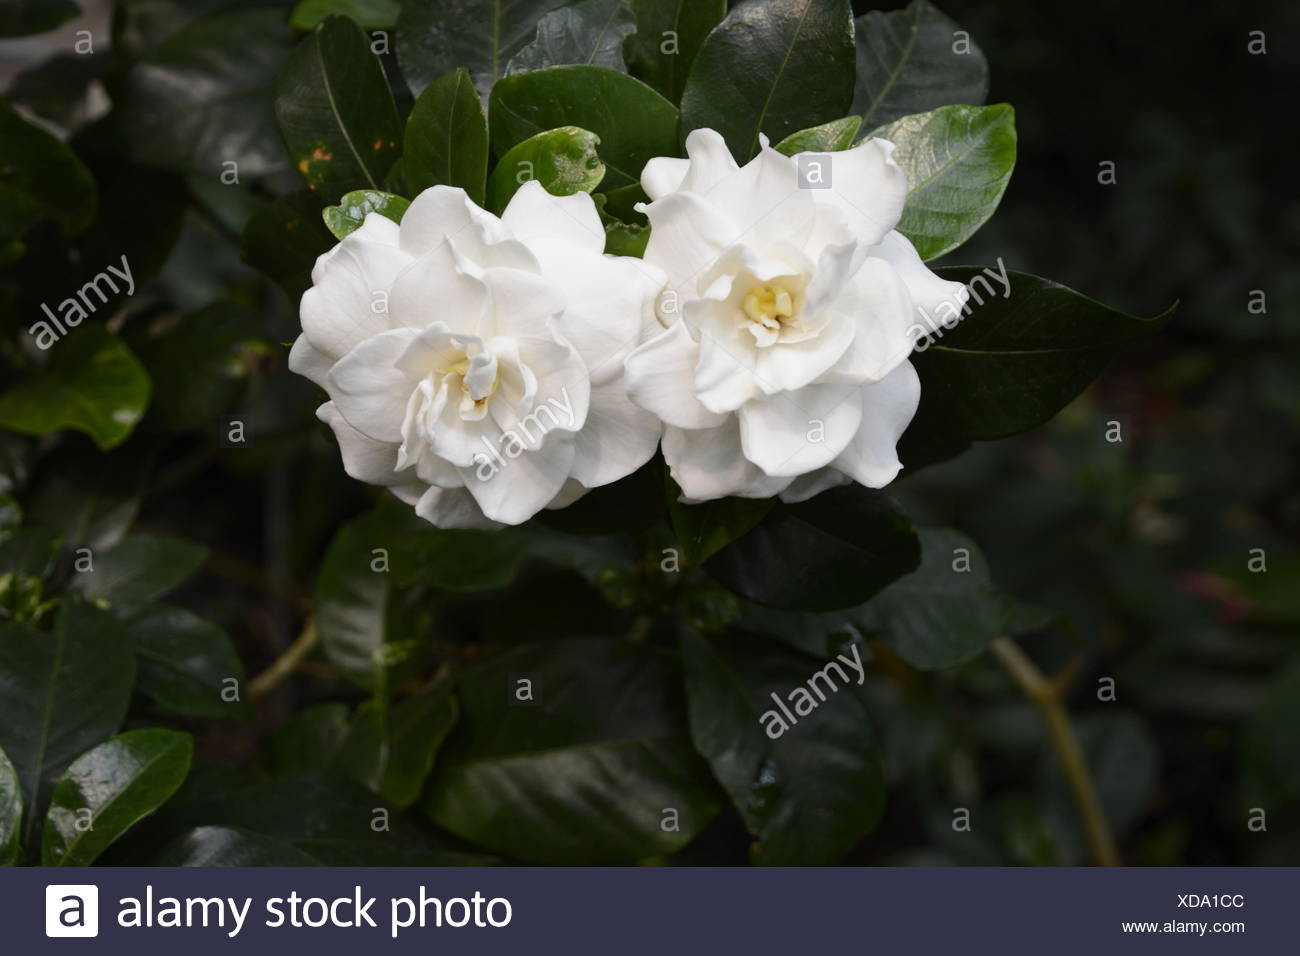 White Gardenia Flower Stock Photo 283577068 Alamy